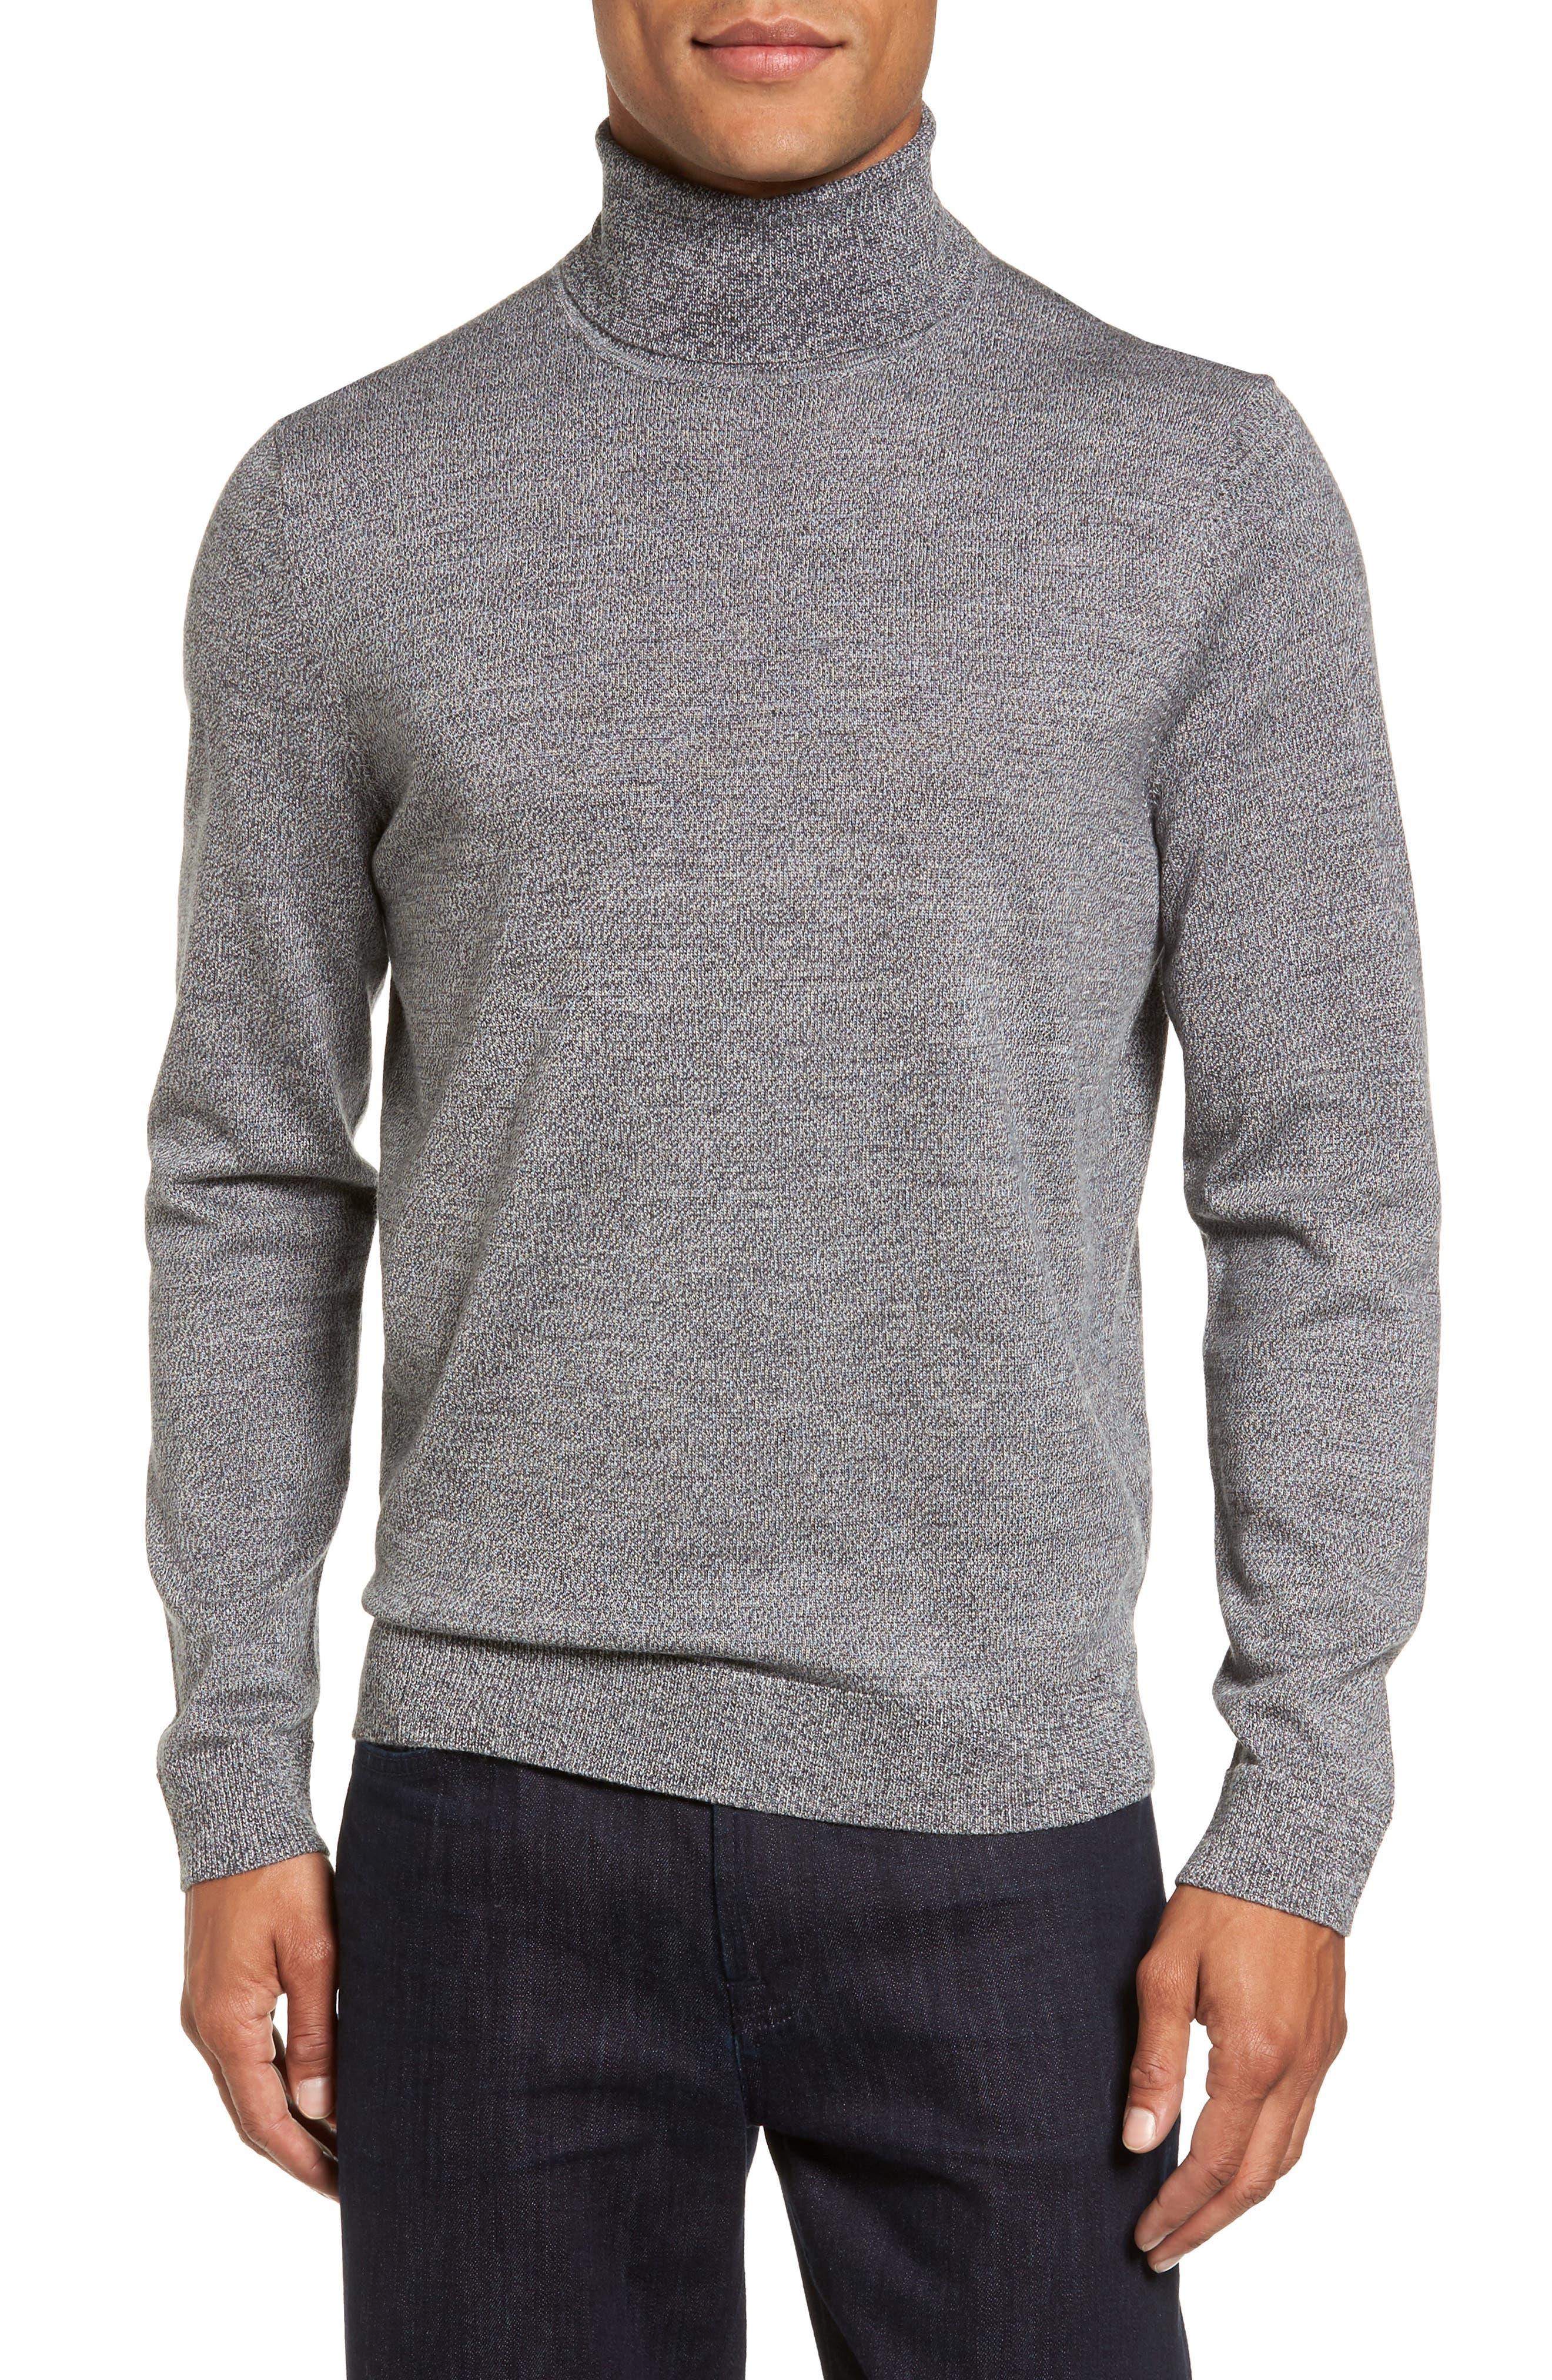 Merino Wool Turtleneck Sweater,                         Main,                         color, Grey Shade Marl